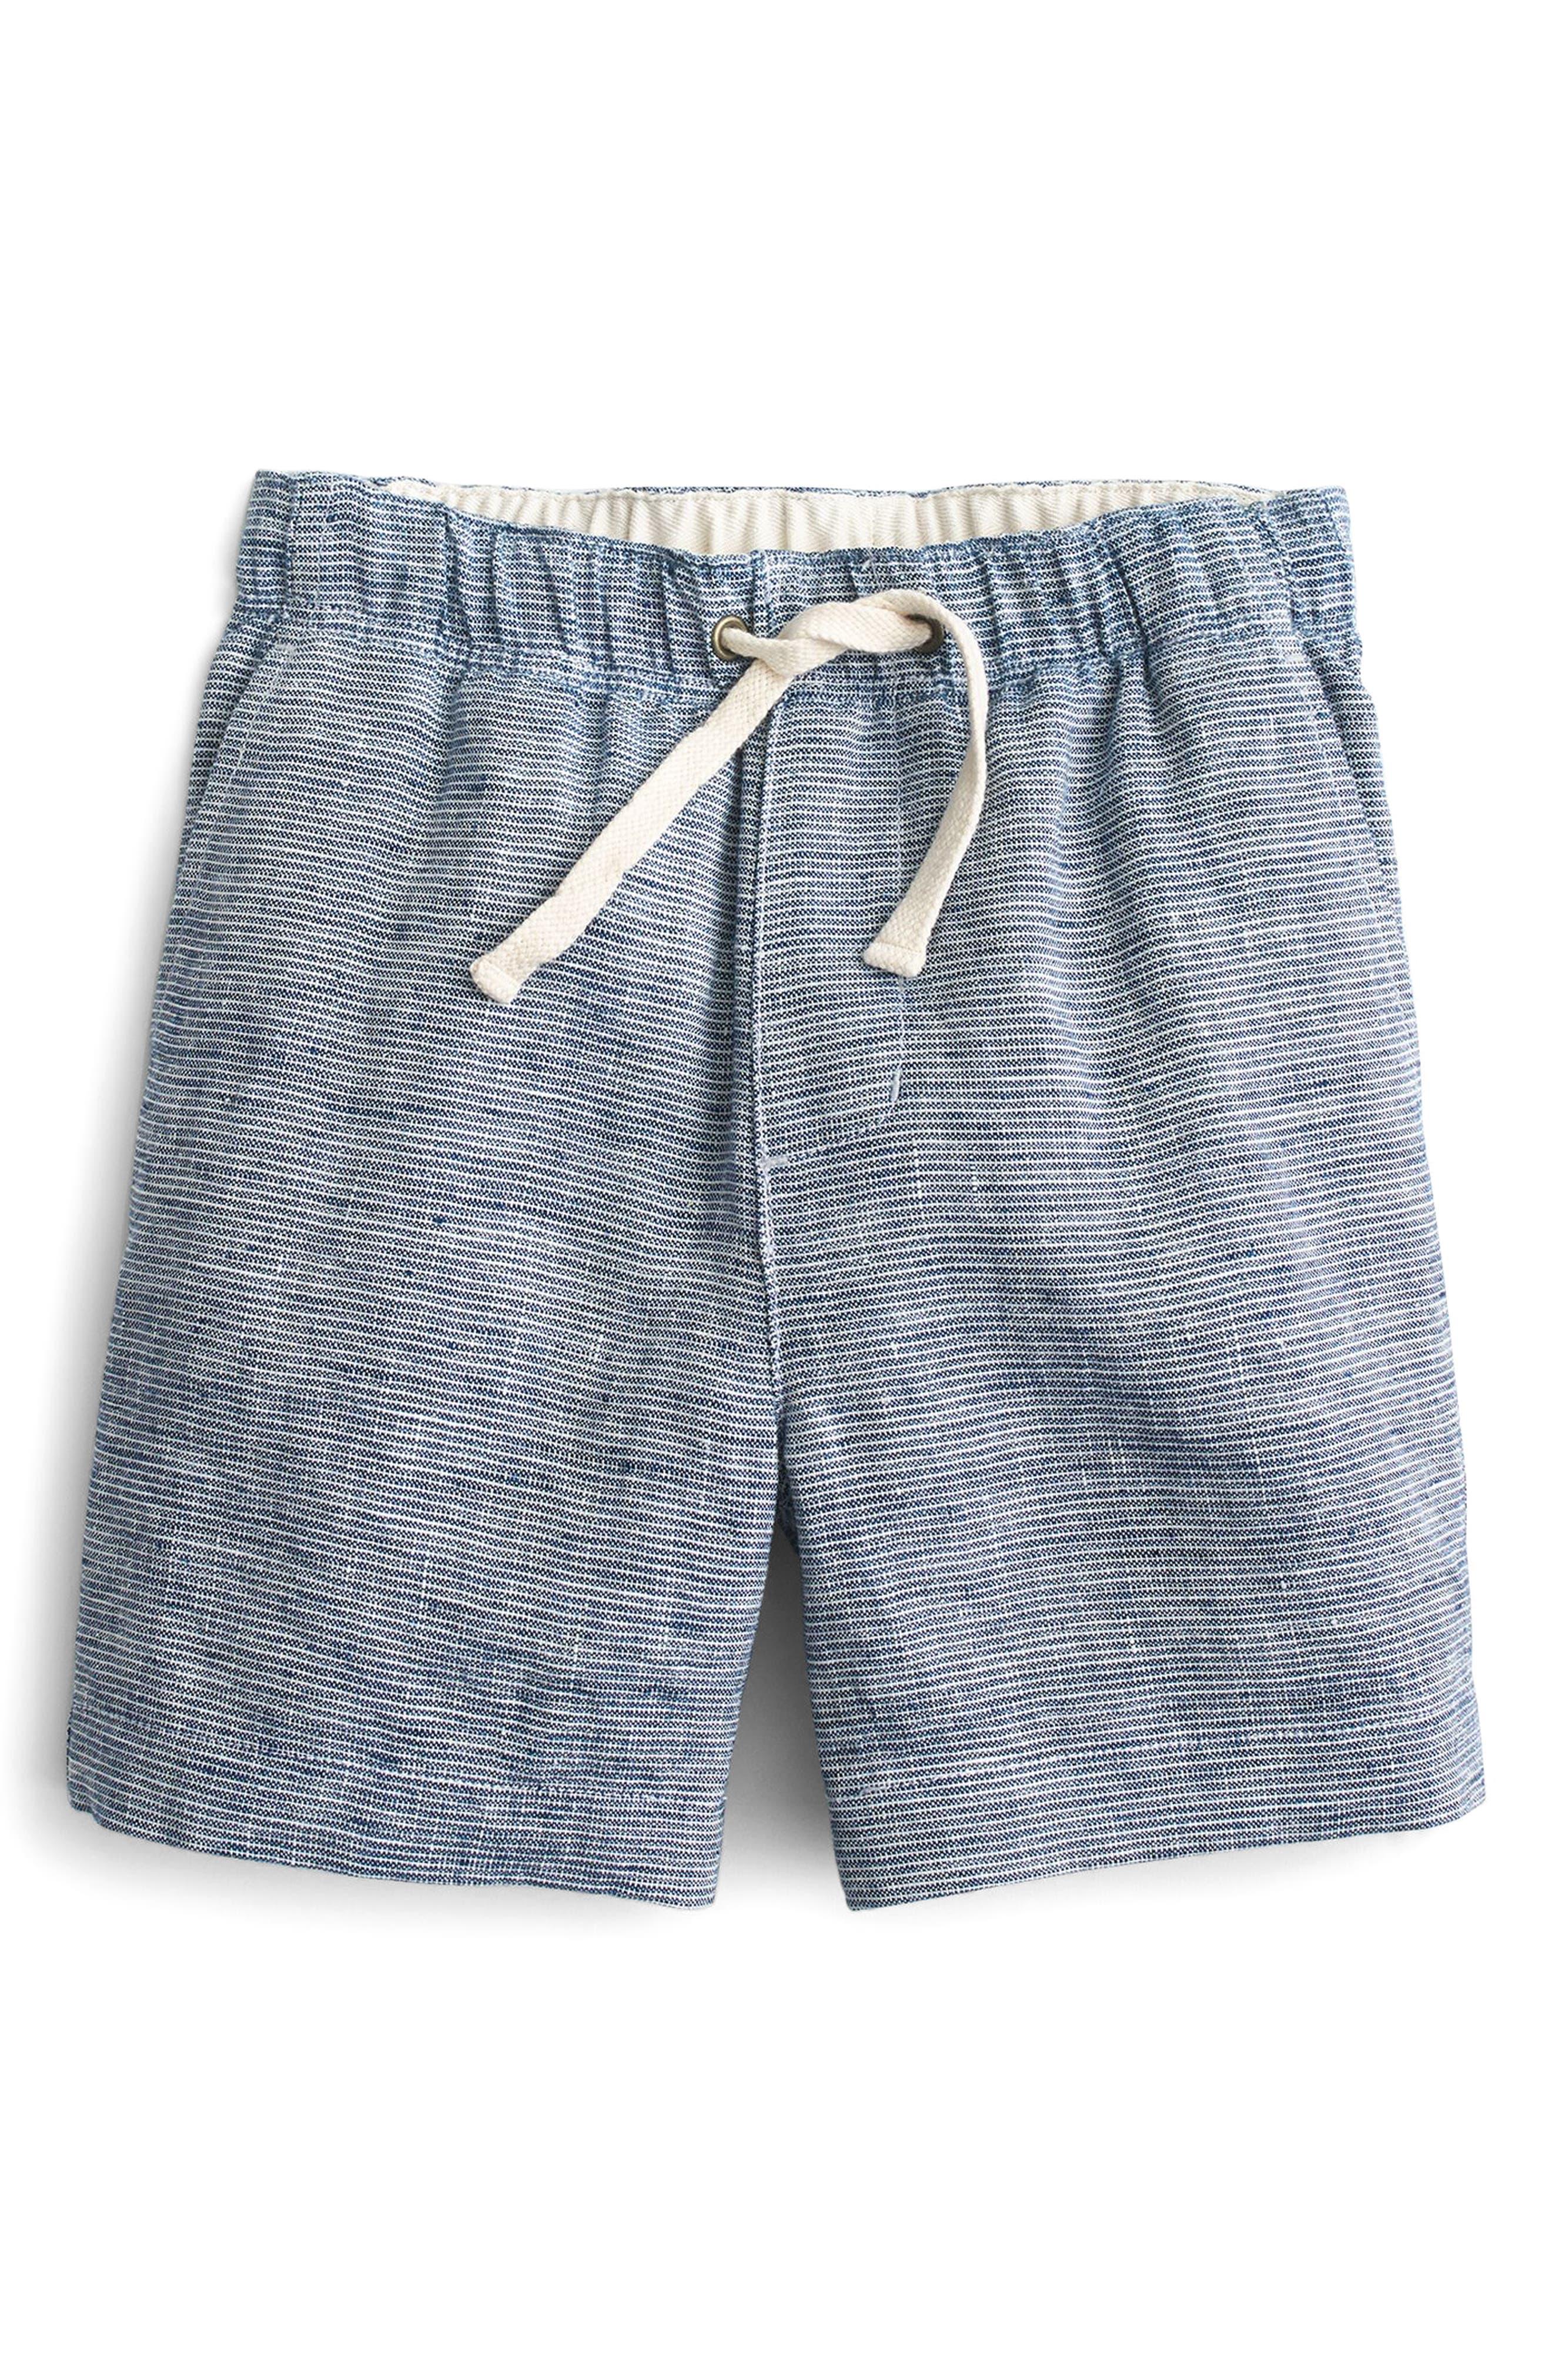 crewcuts by J.Crew Stripe Linen Dock Shorts (Toddler Boys, Little Boys & Big Boys)